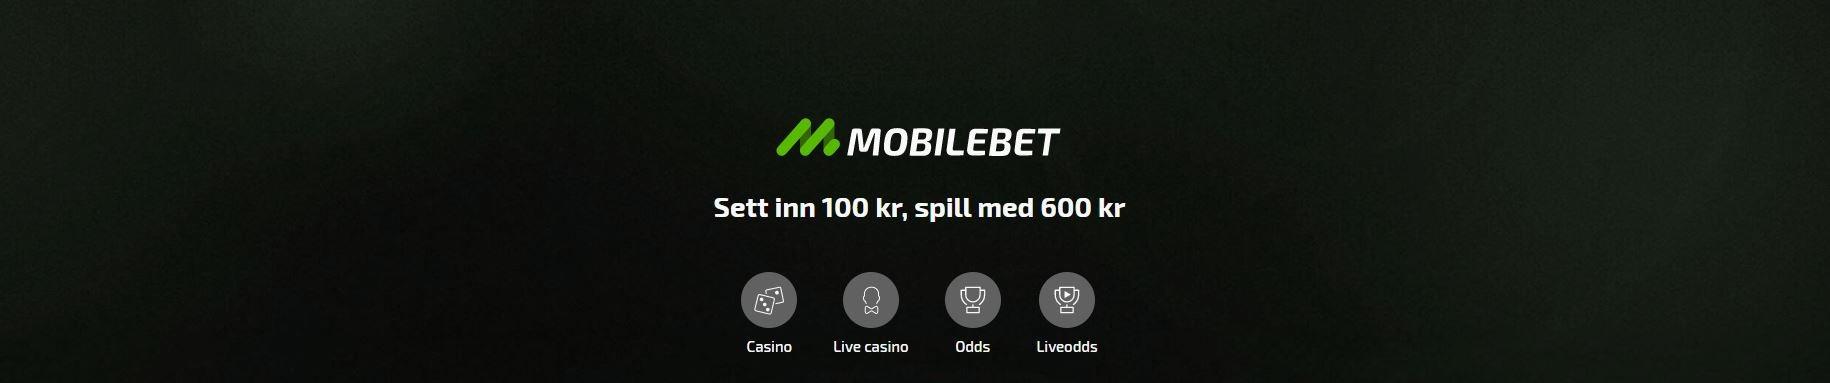 mobilebet bonus